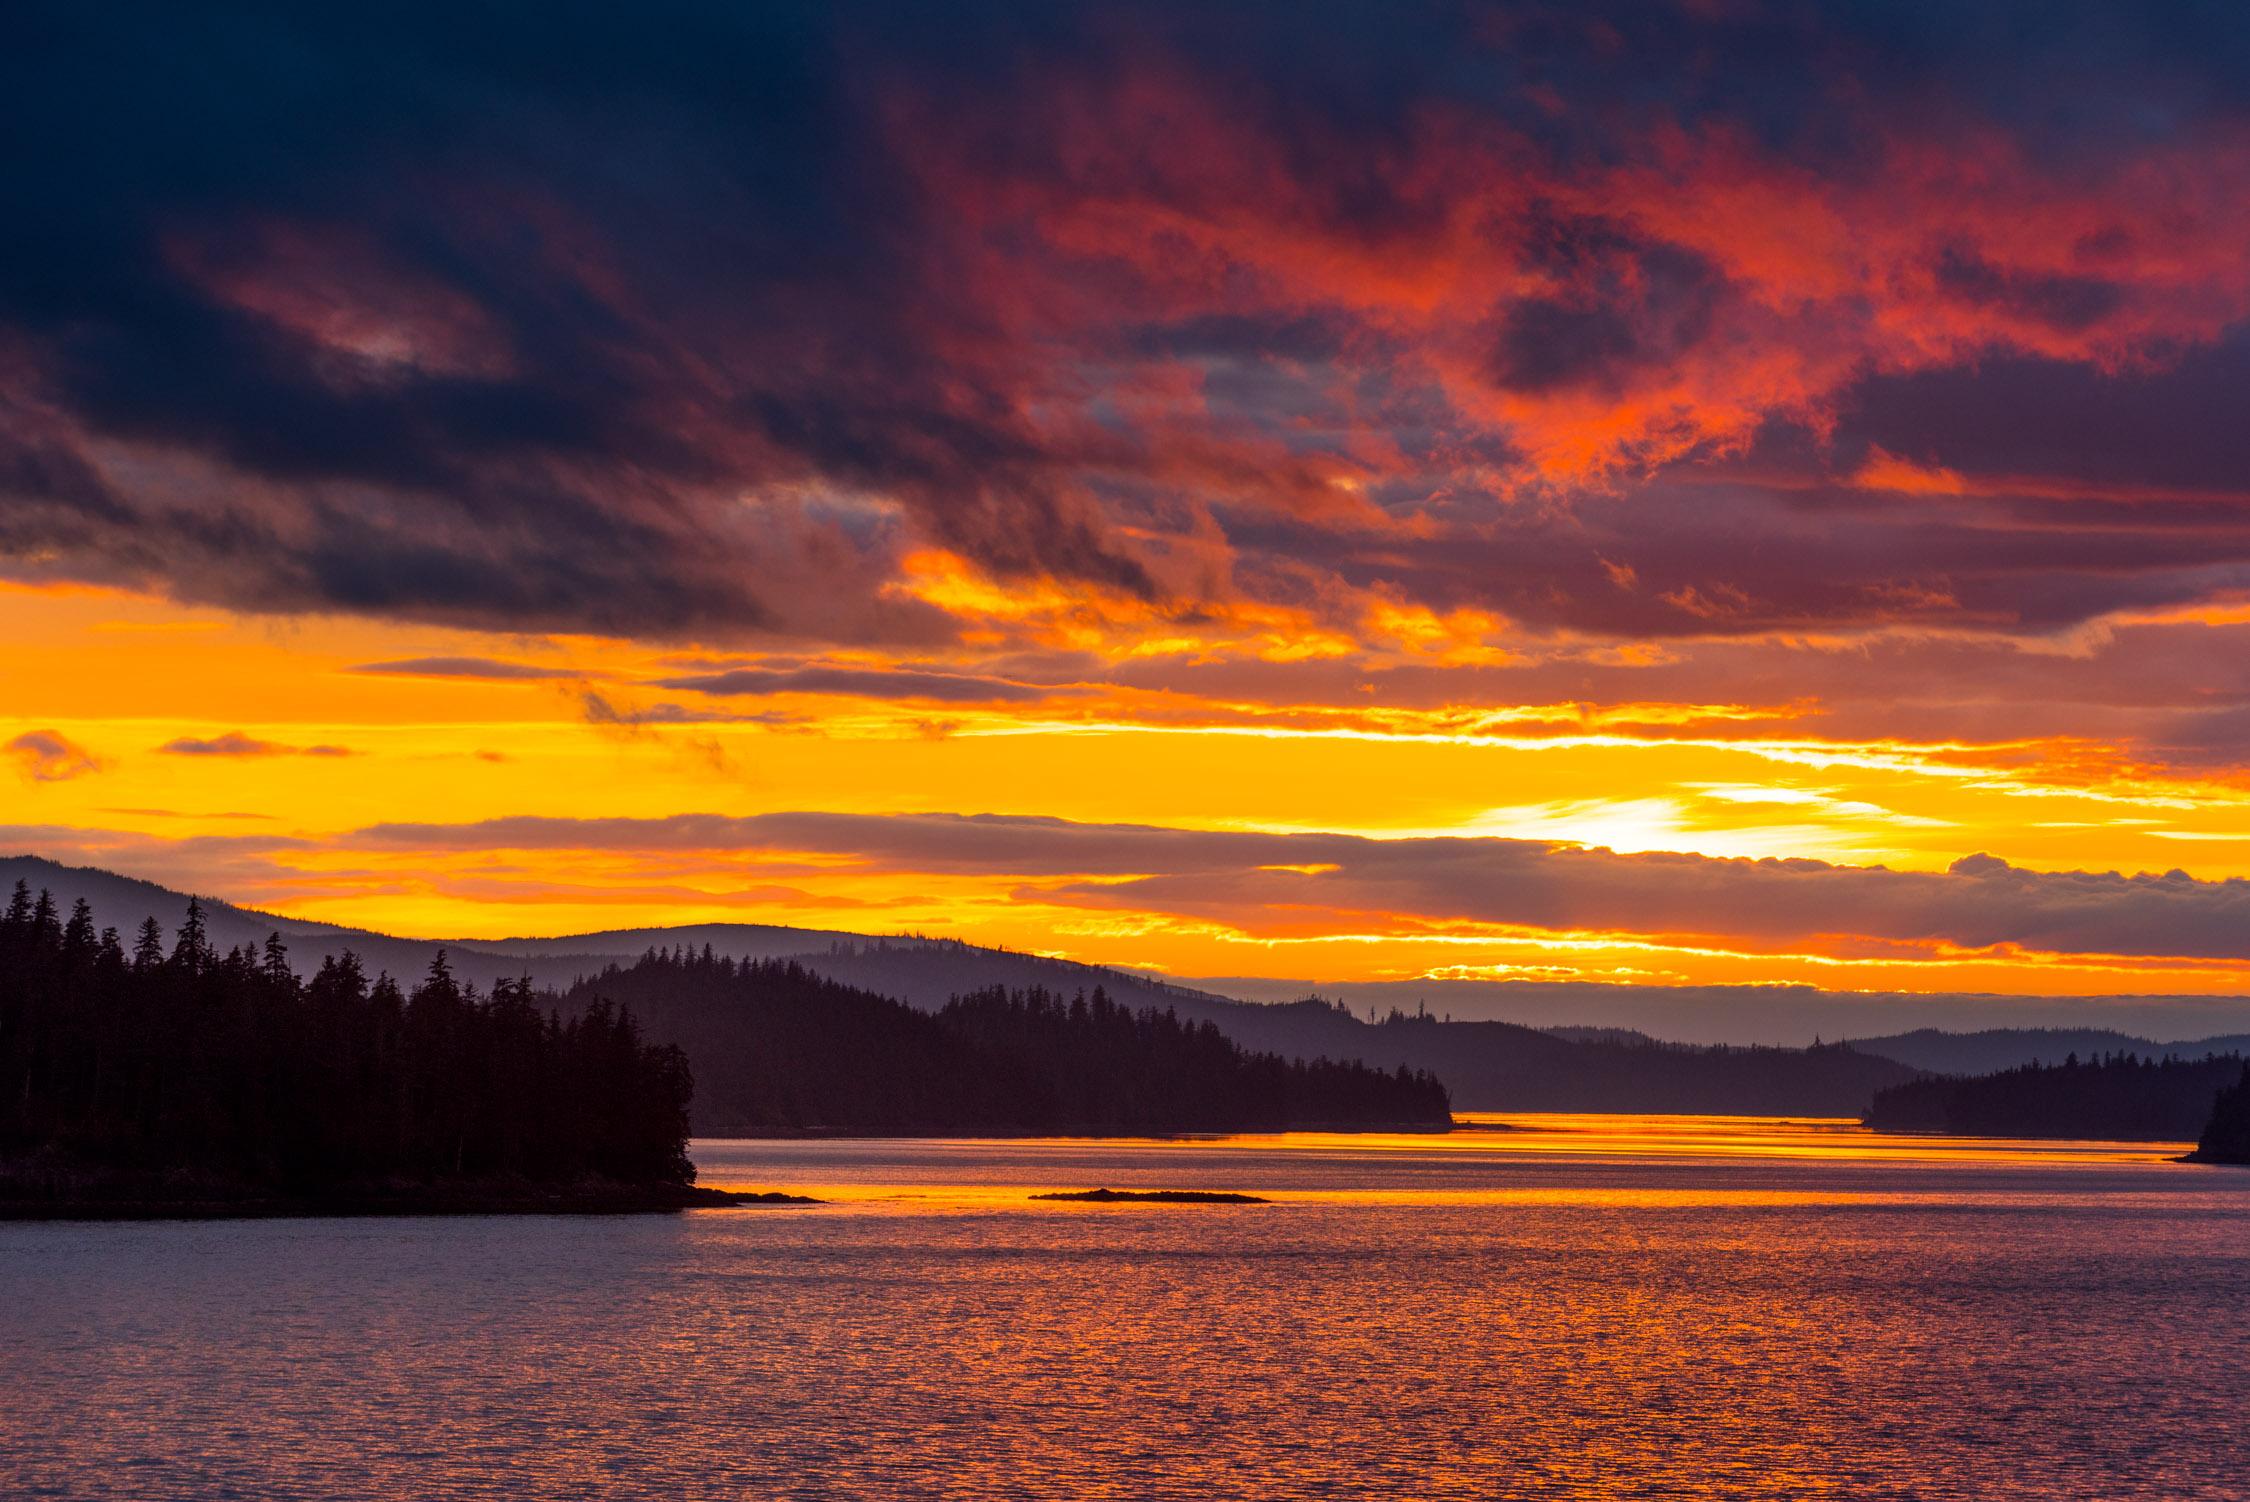 Alaska has some pretty amazing sunsets!